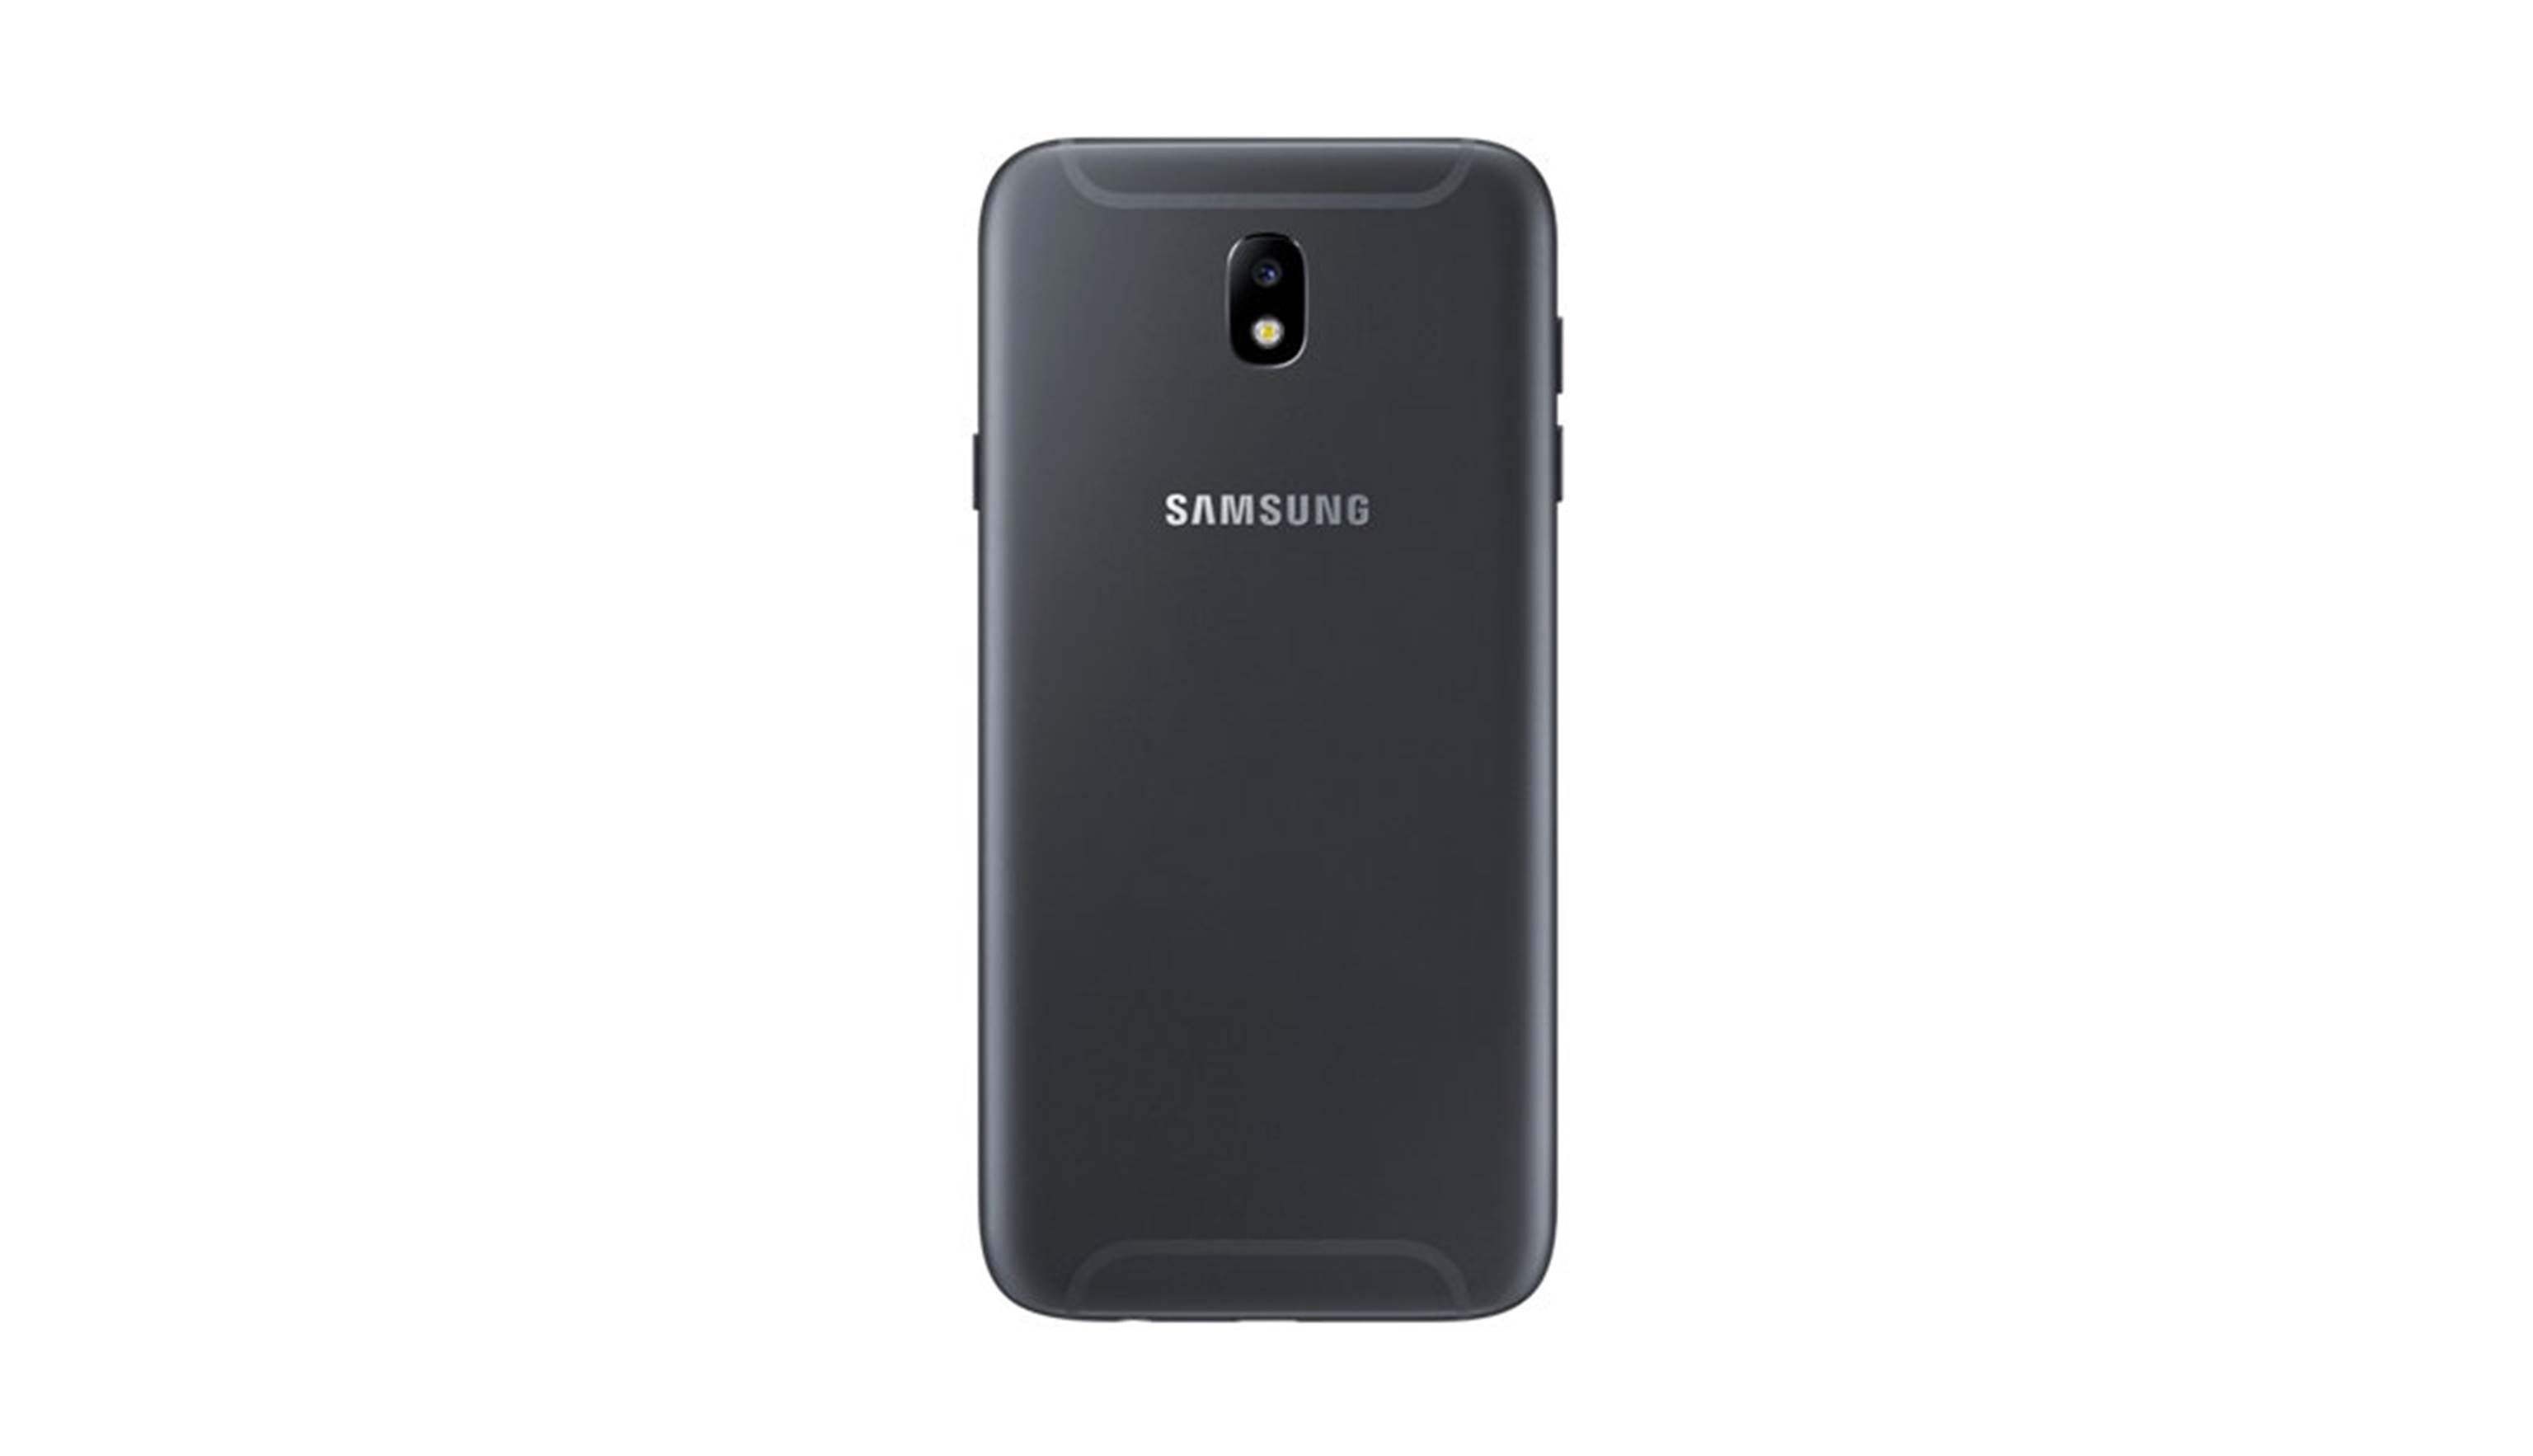 Samsung J7 PRO - Black (2)